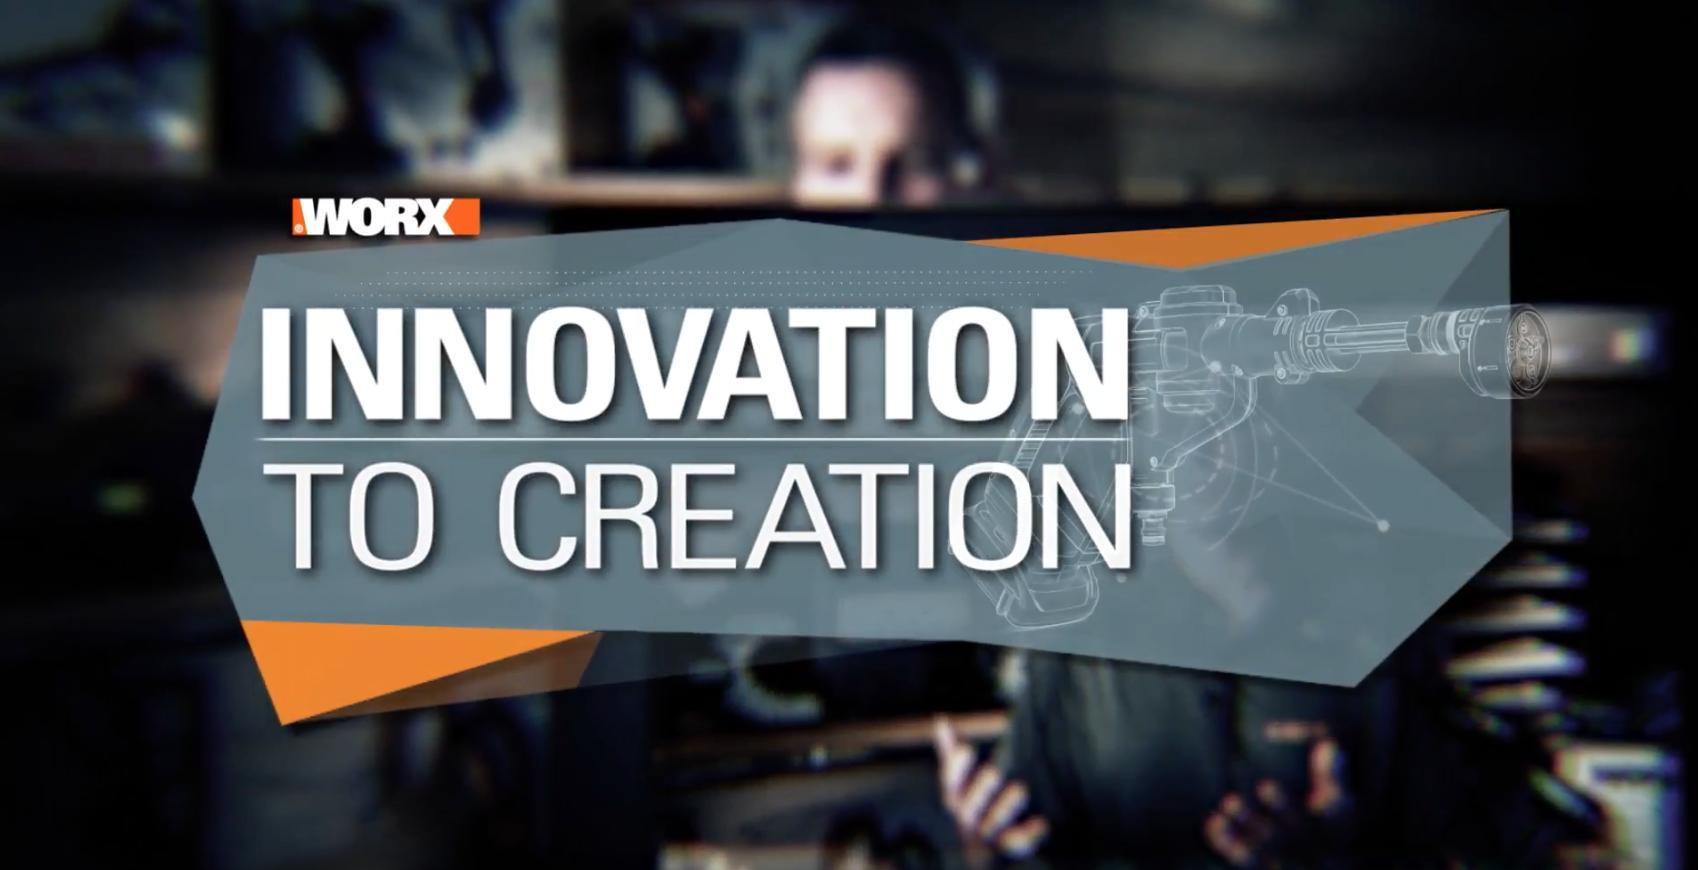 Hydroshot Innovation to Creation